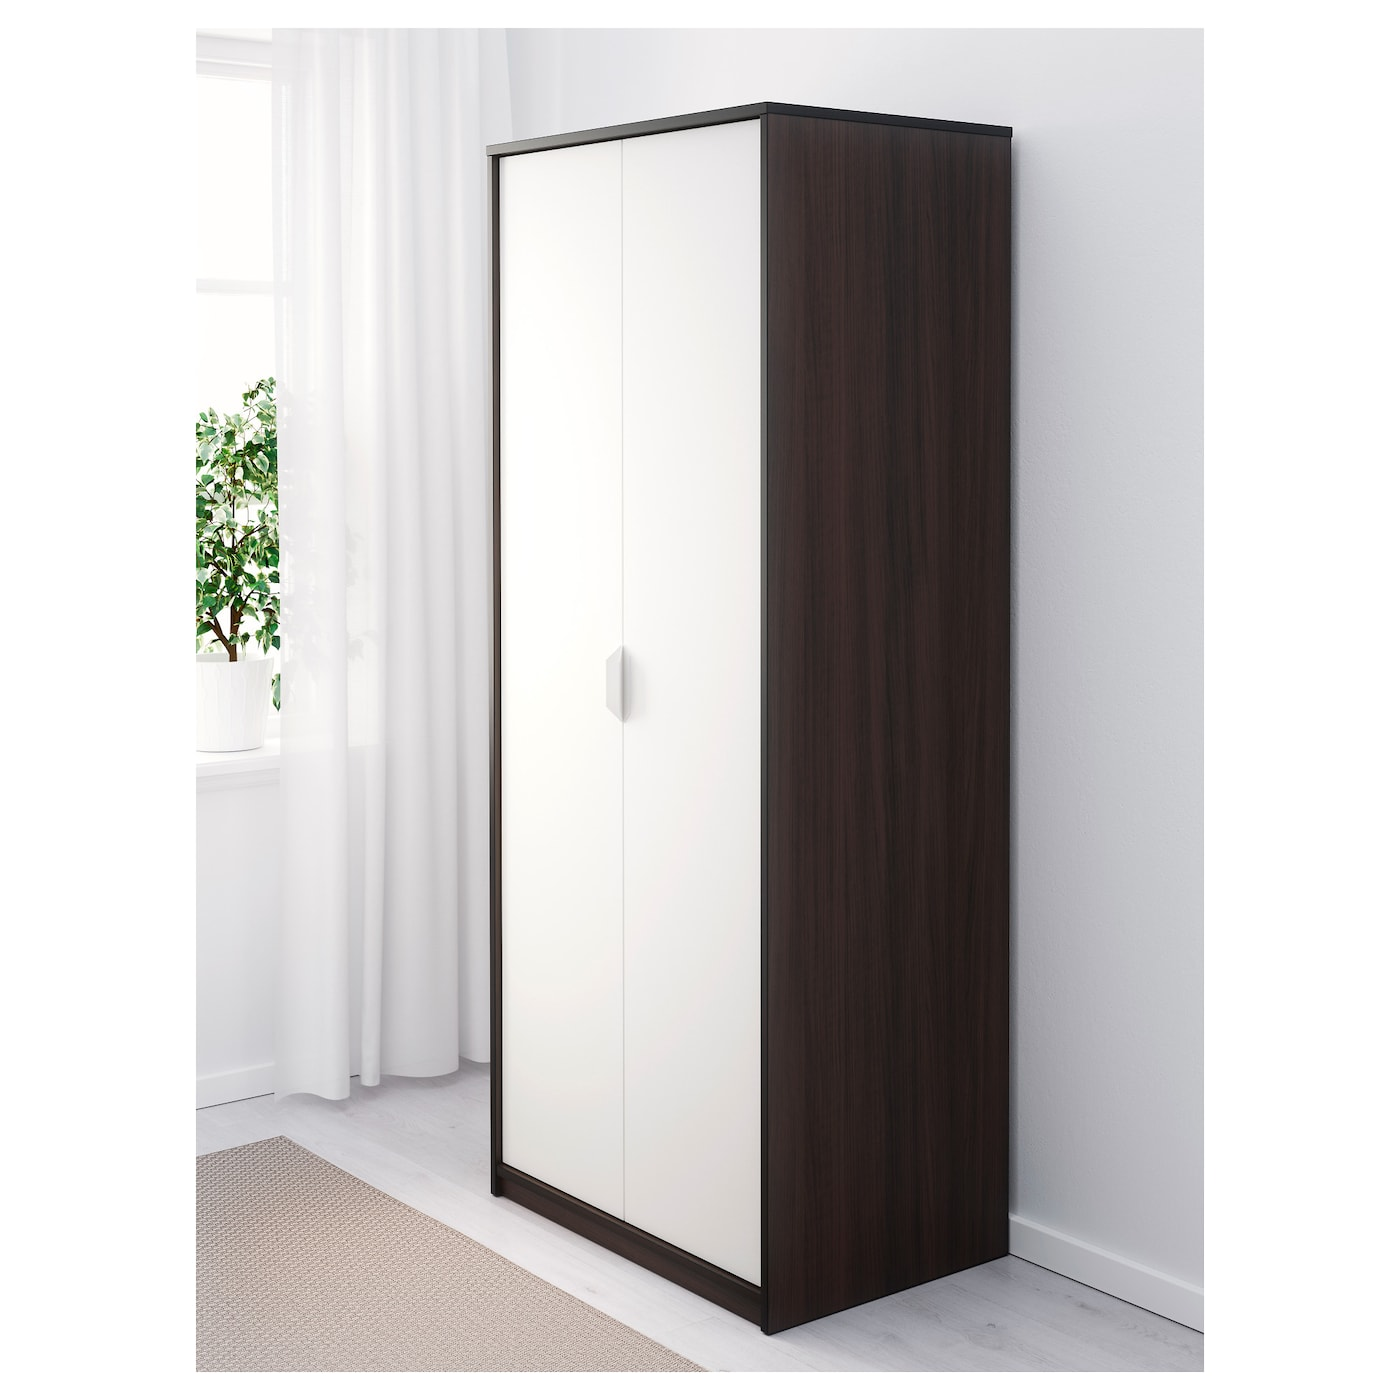 askvoll armoire brun noir blanc 80 x 52 x 189 cm ikea. Black Bedroom Furniture Sets. Home Design Ideas